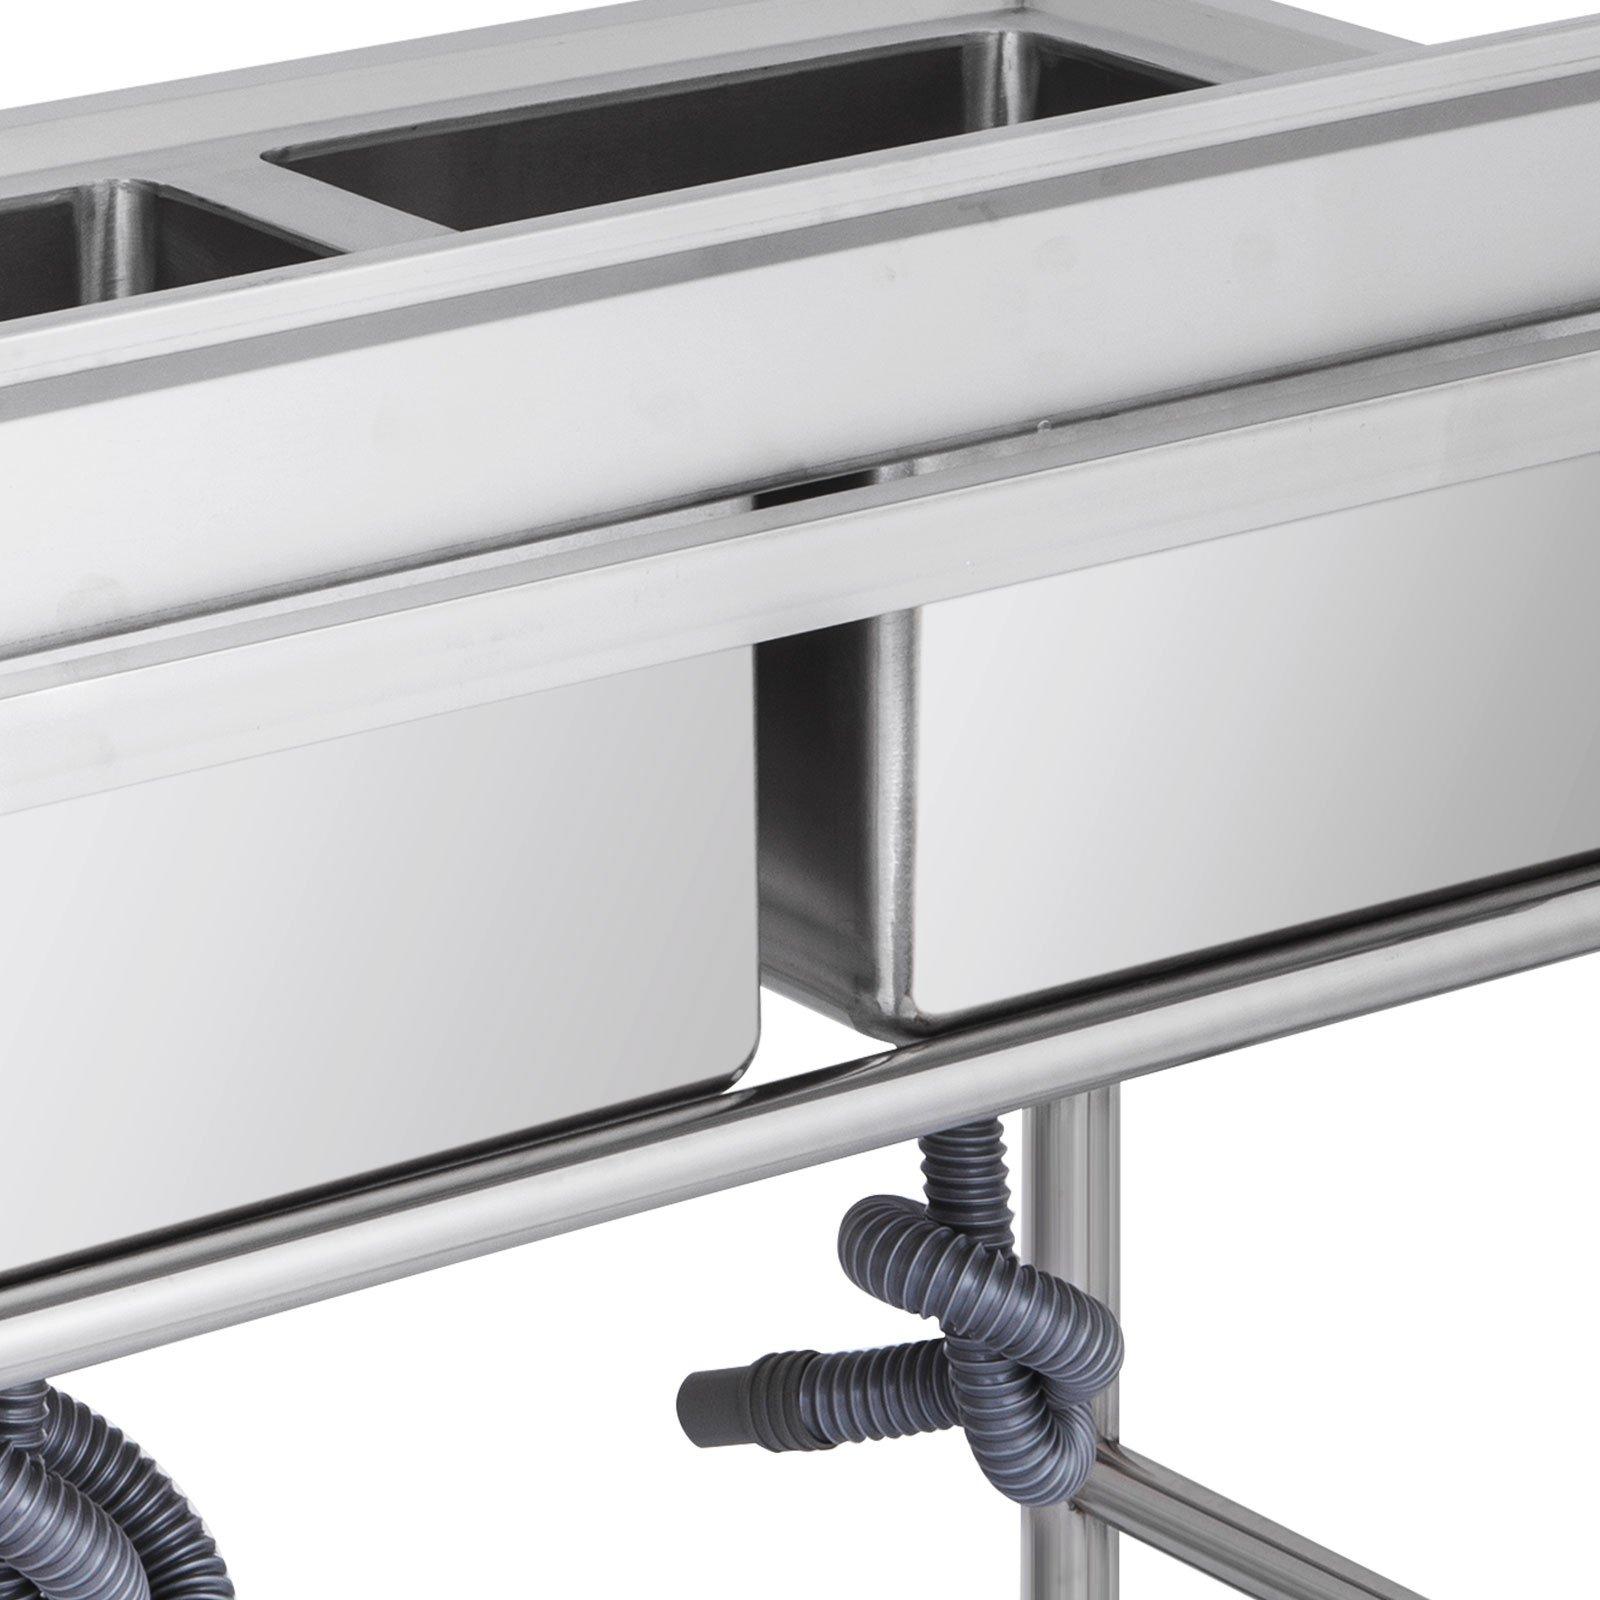 "Mophorn 2 Compartment Stainless Steel Bar Sink 15.5"" x 16.5""Bowl Size Handmade Underbar Sink for bar, kitchen restaurant by Mophorn (Image #4)"